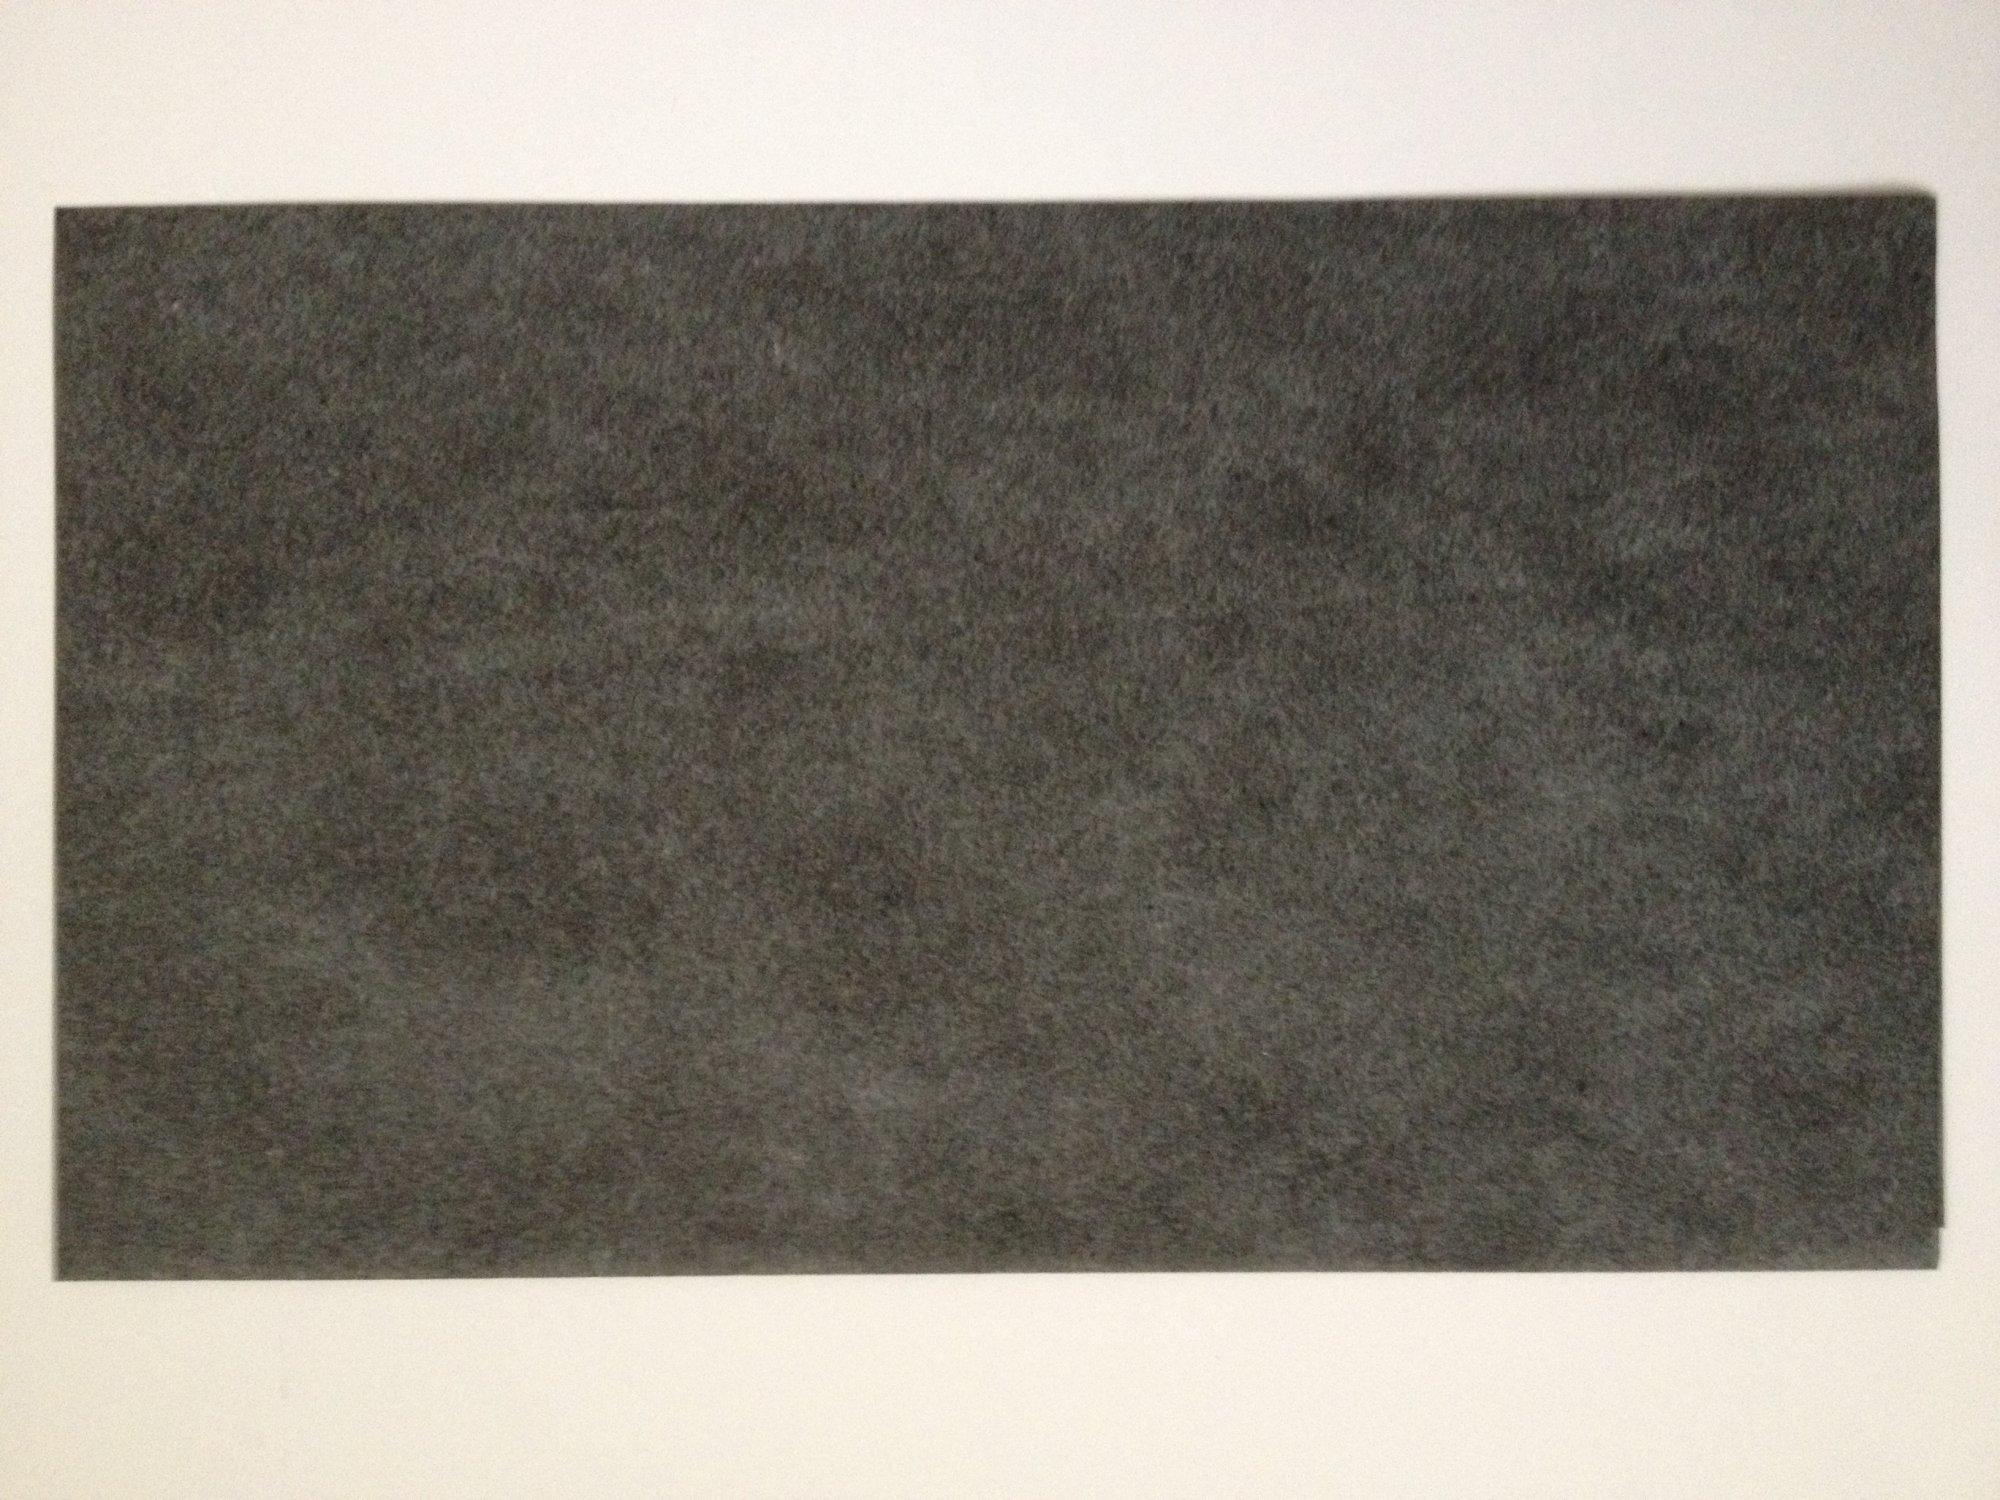 Royal Langnickel Gray Graphite Paper 1 - 9 x 13 sheet